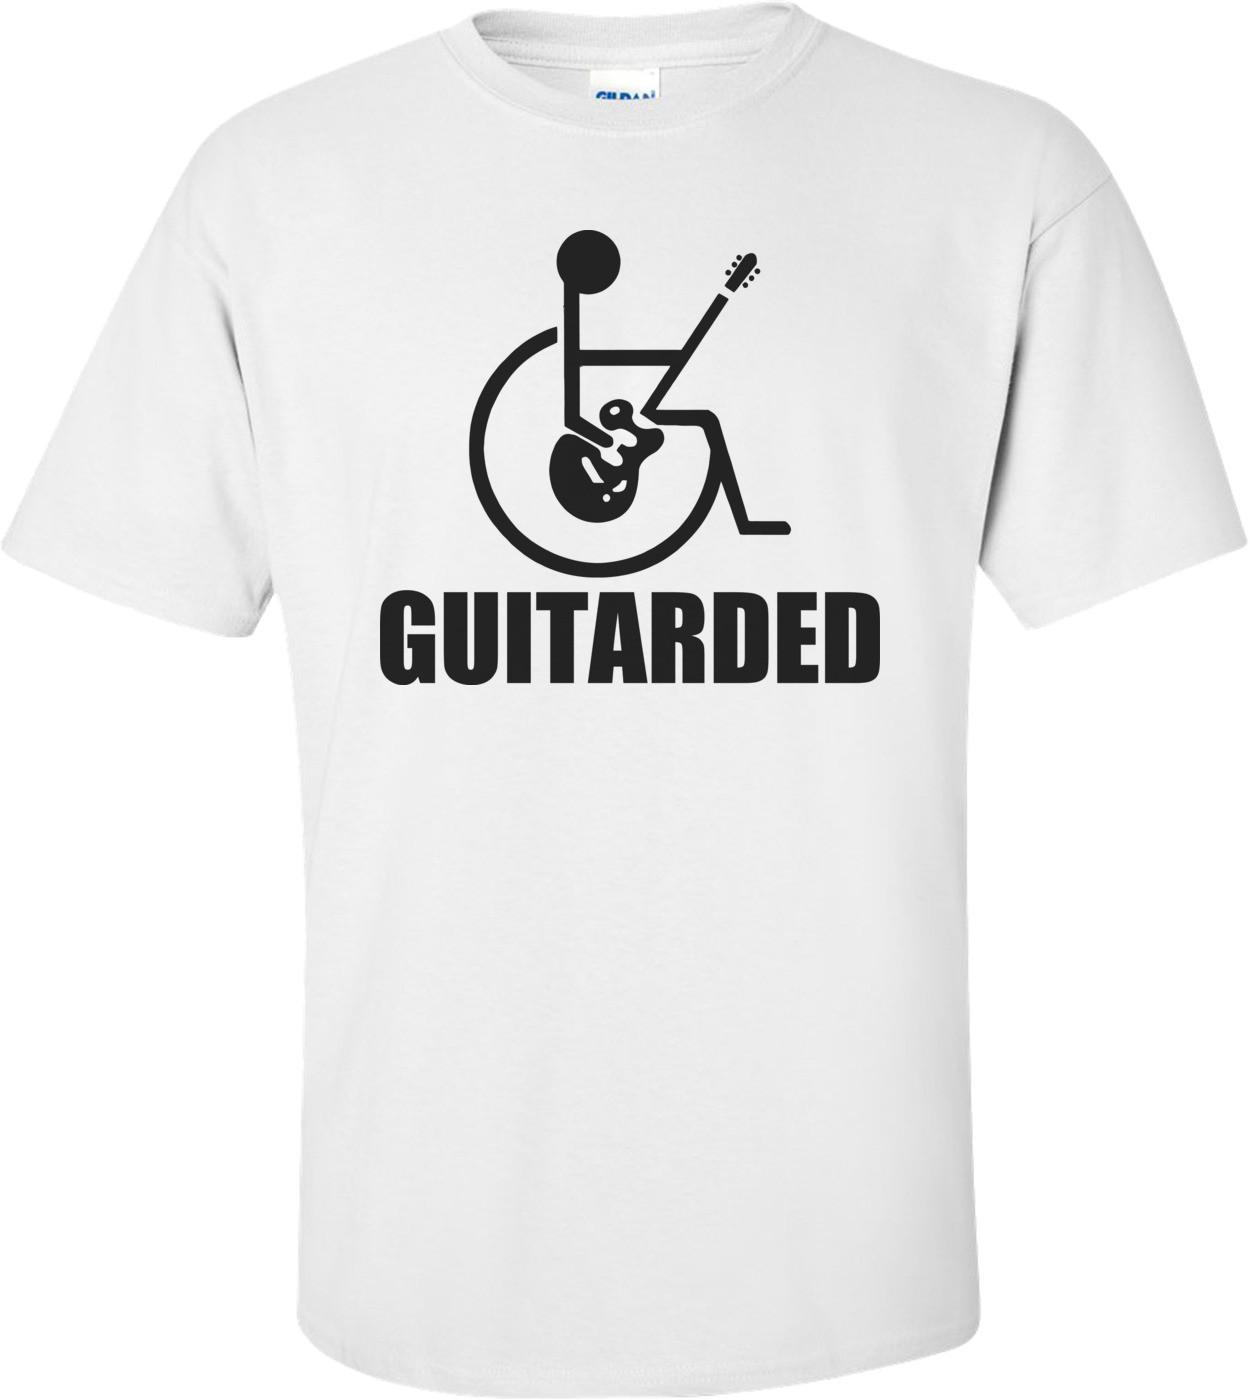 Guitarded Shirt